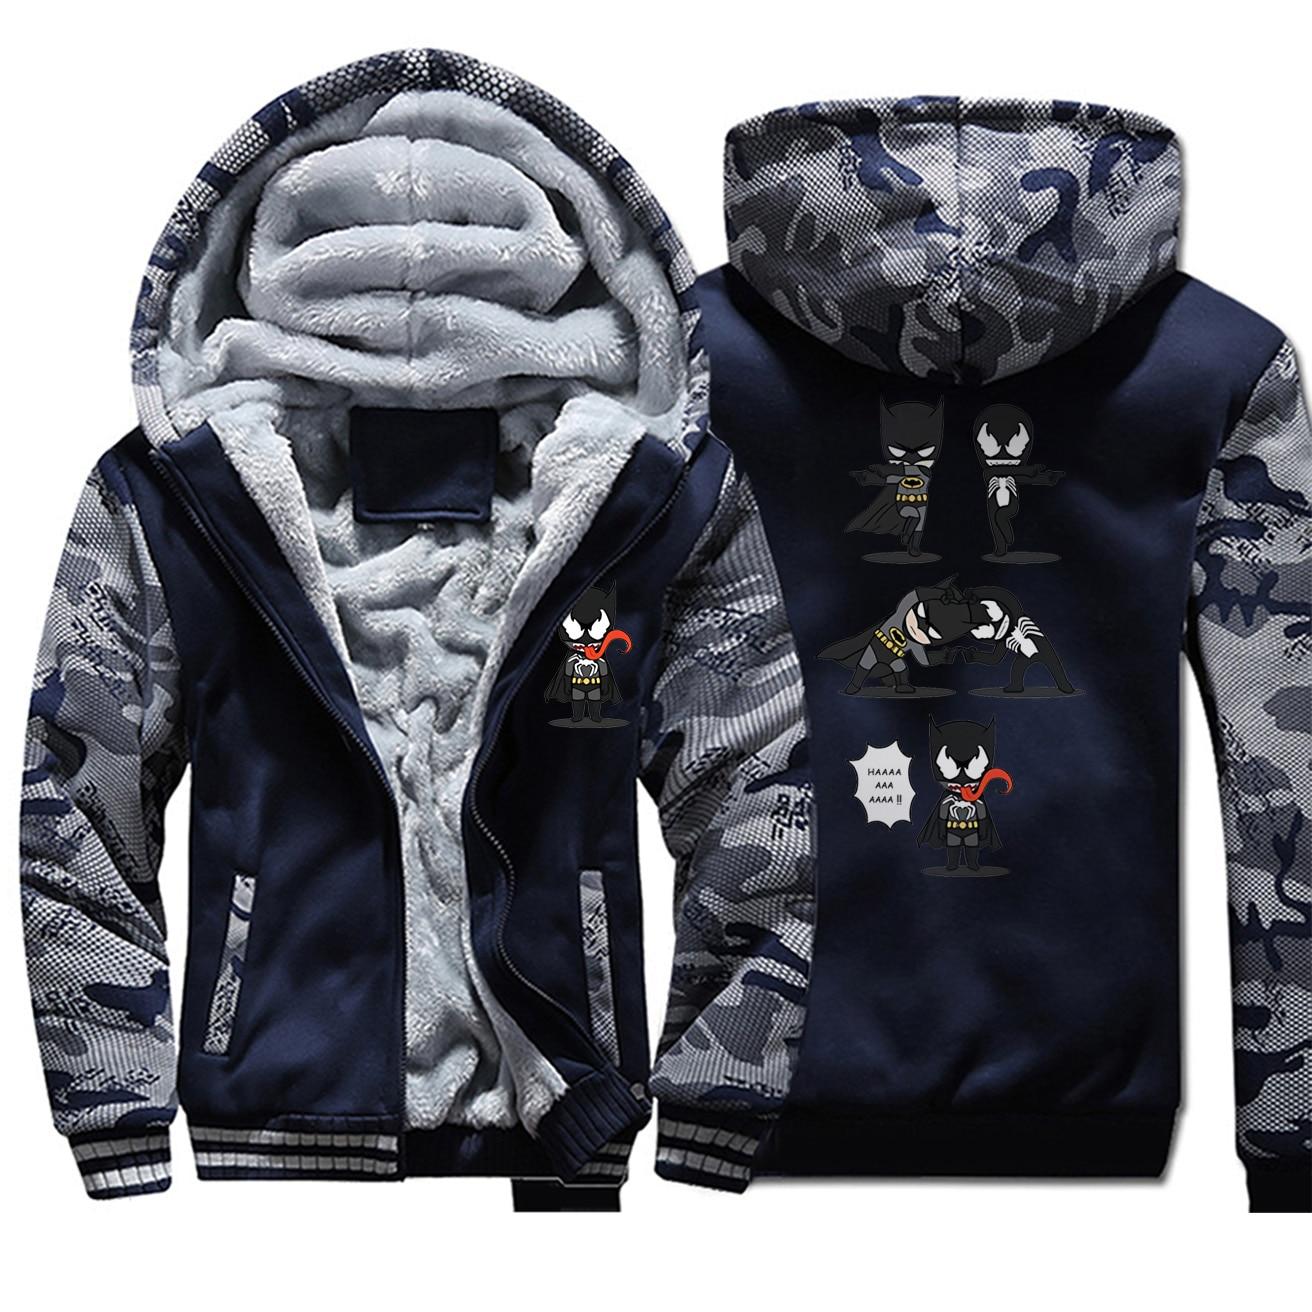 Batman vs Venom Thick Sweatshirt Superhero Crossover Funny Camouflage Hoodies Mens Cool Design Zip Jacket Men Winter Streetwear